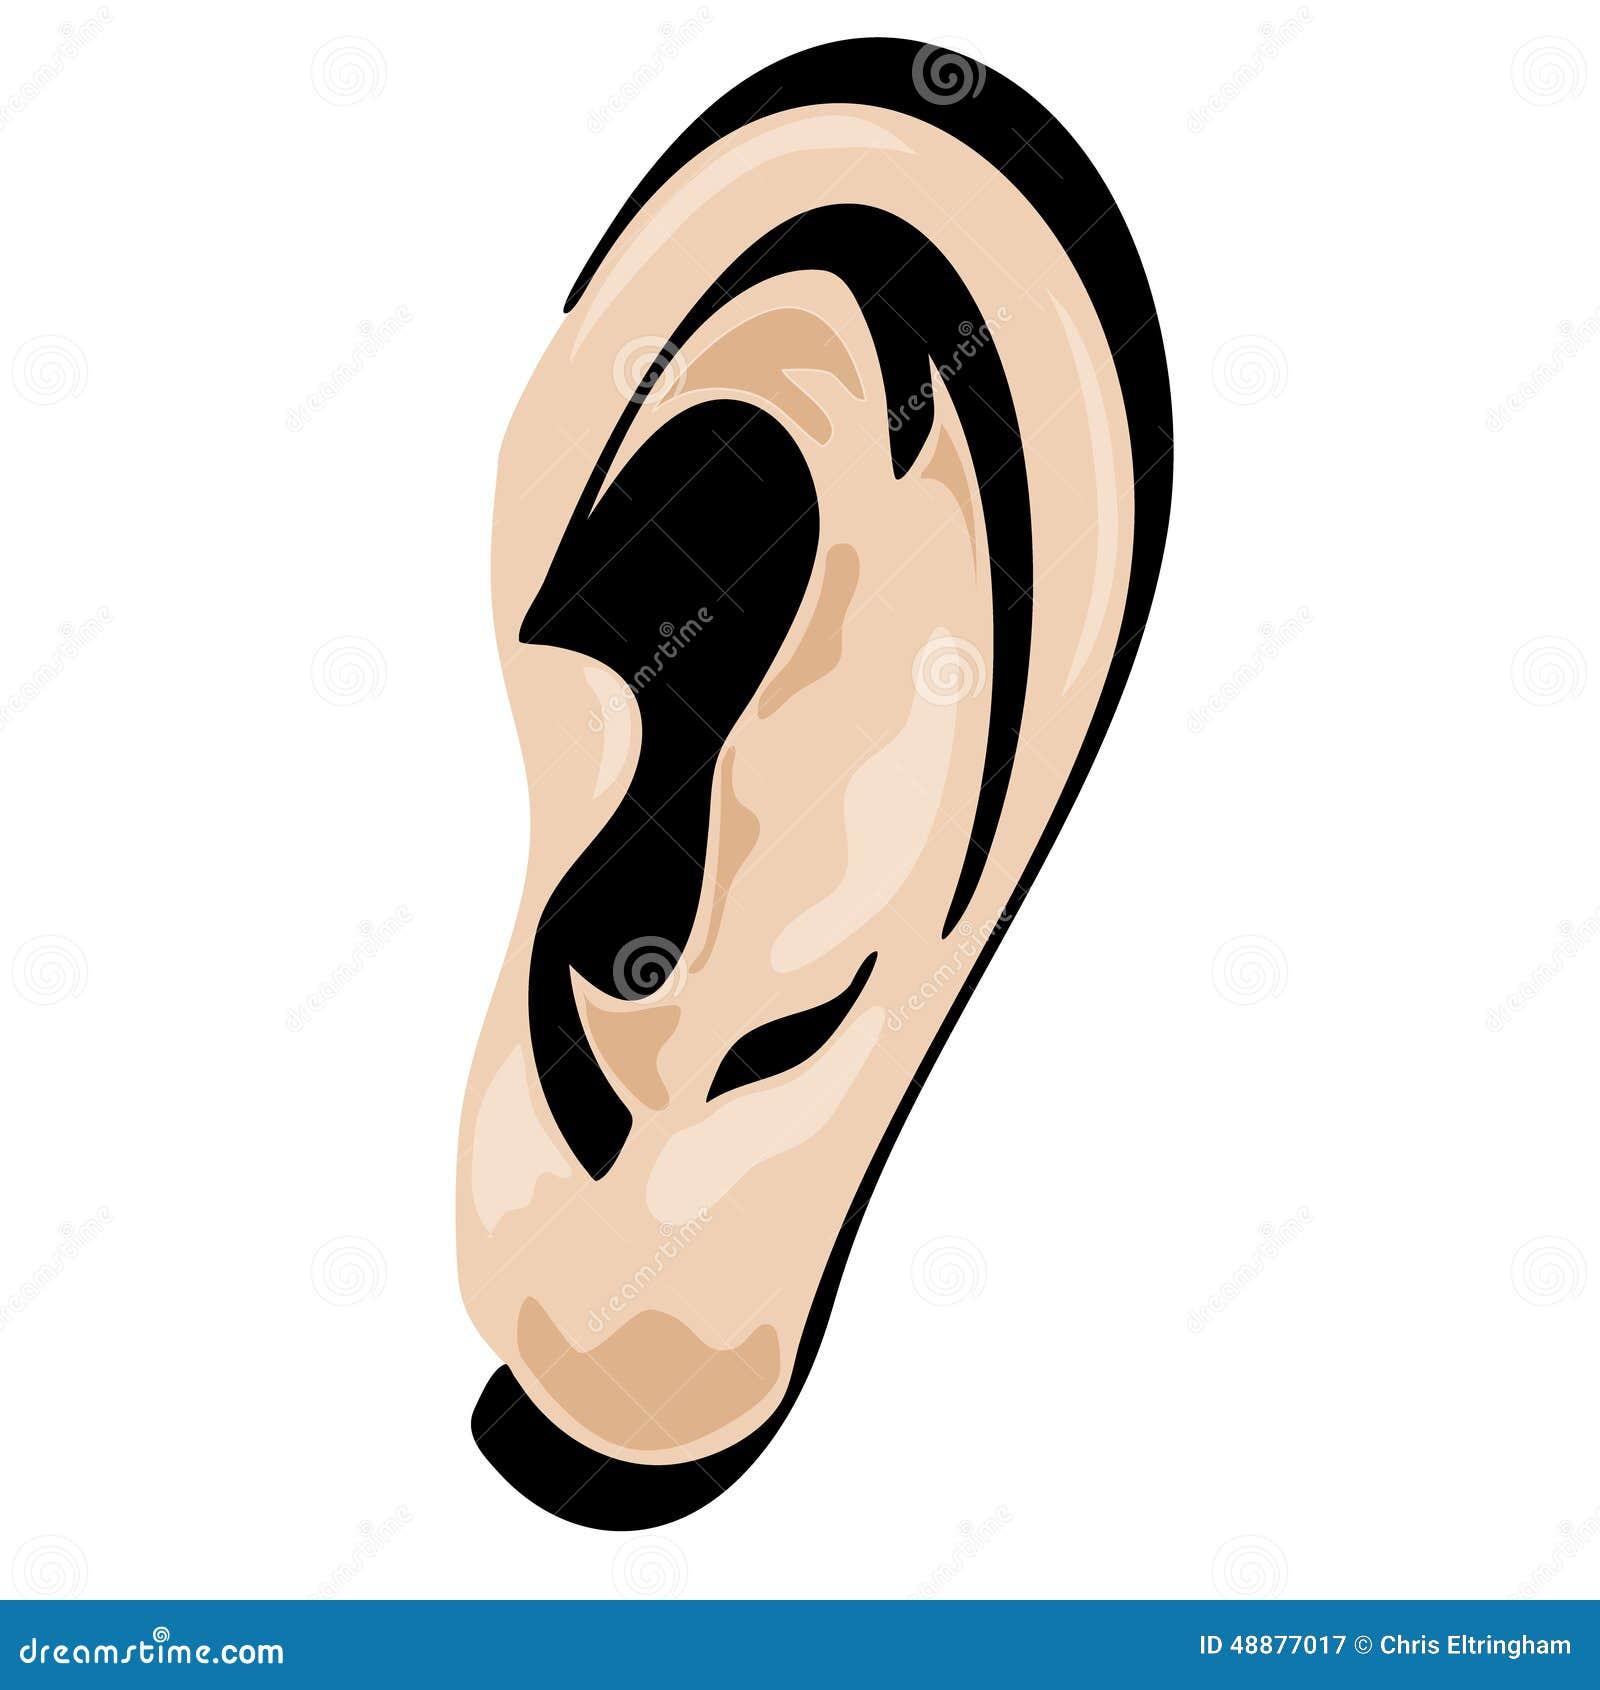 Illustration Stock Ic Ne D Oreille Image46751325 besides Stock Illustration Ear Vector Cartoon Shaded Isolated Image48877017 in addition Listen additionally E5 8D A1 E9 80 9A E5 B0 8F E7 8C AB E5 92 AA E5 9B BE E7 89 87 in addition Lions. on cartoon ears clipart